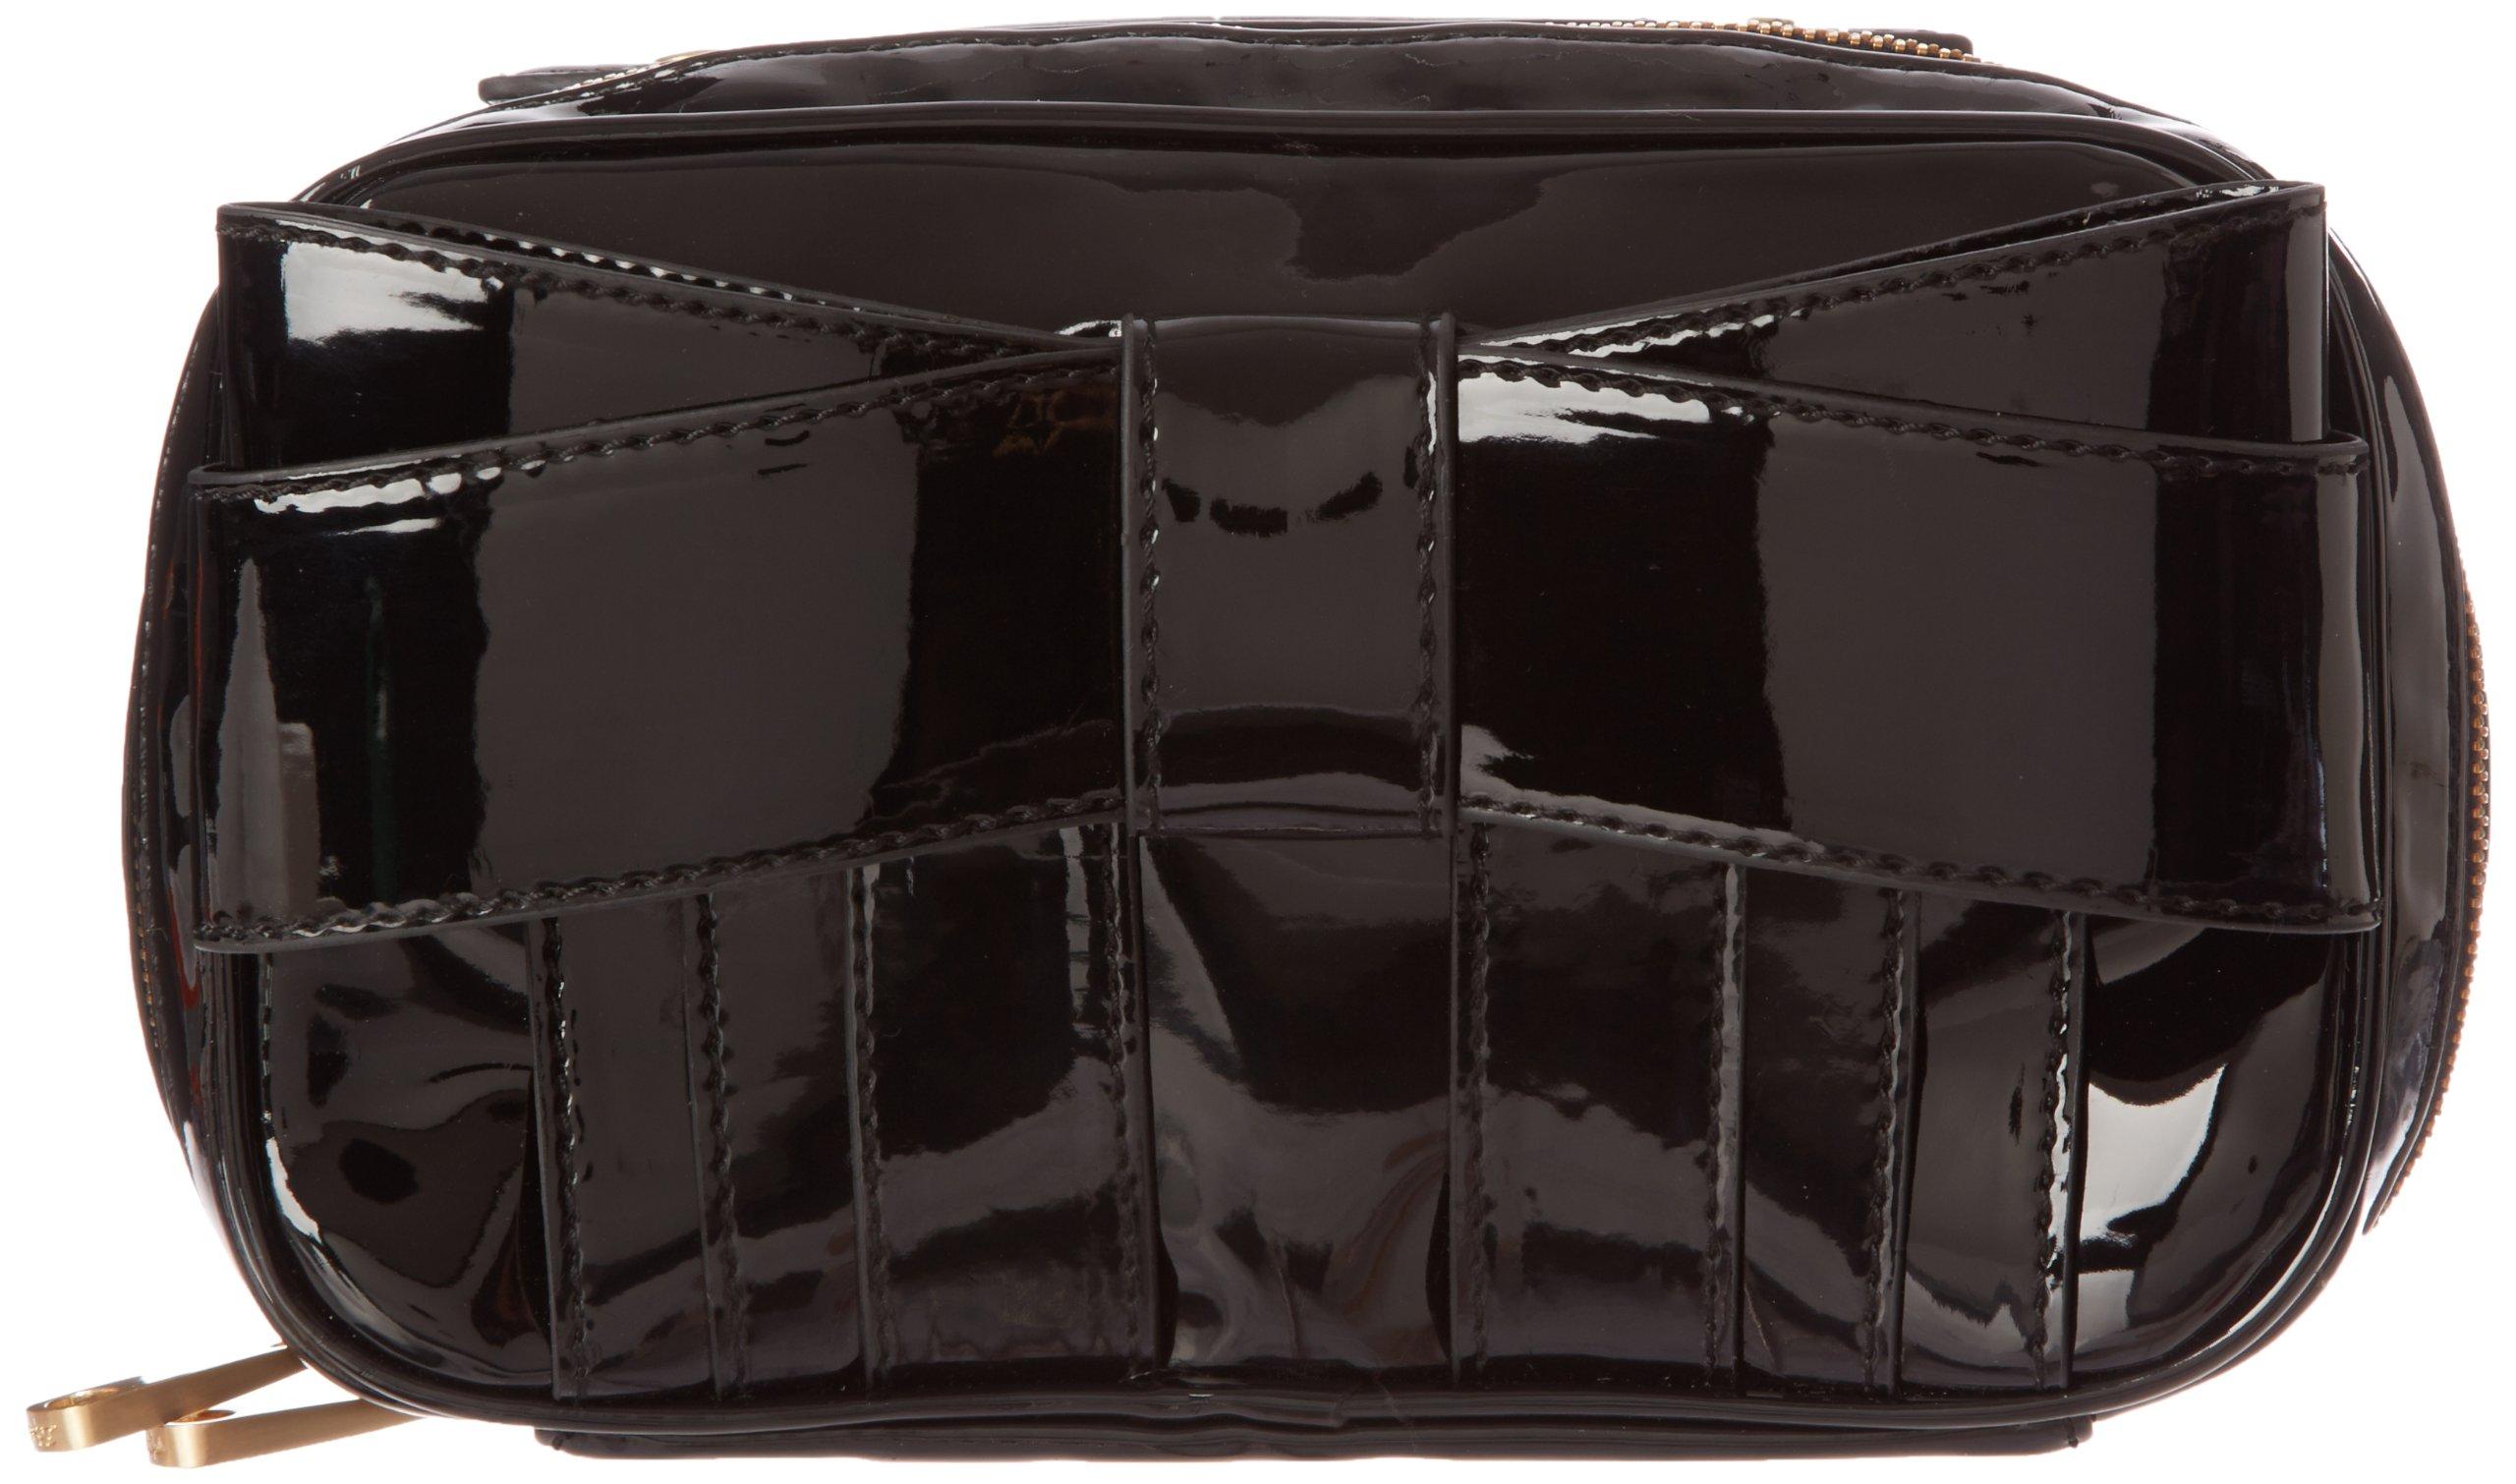 Z Spoke Zac Posen Shirley ZS1346 Cosmetic Case,Black Patent,One Size